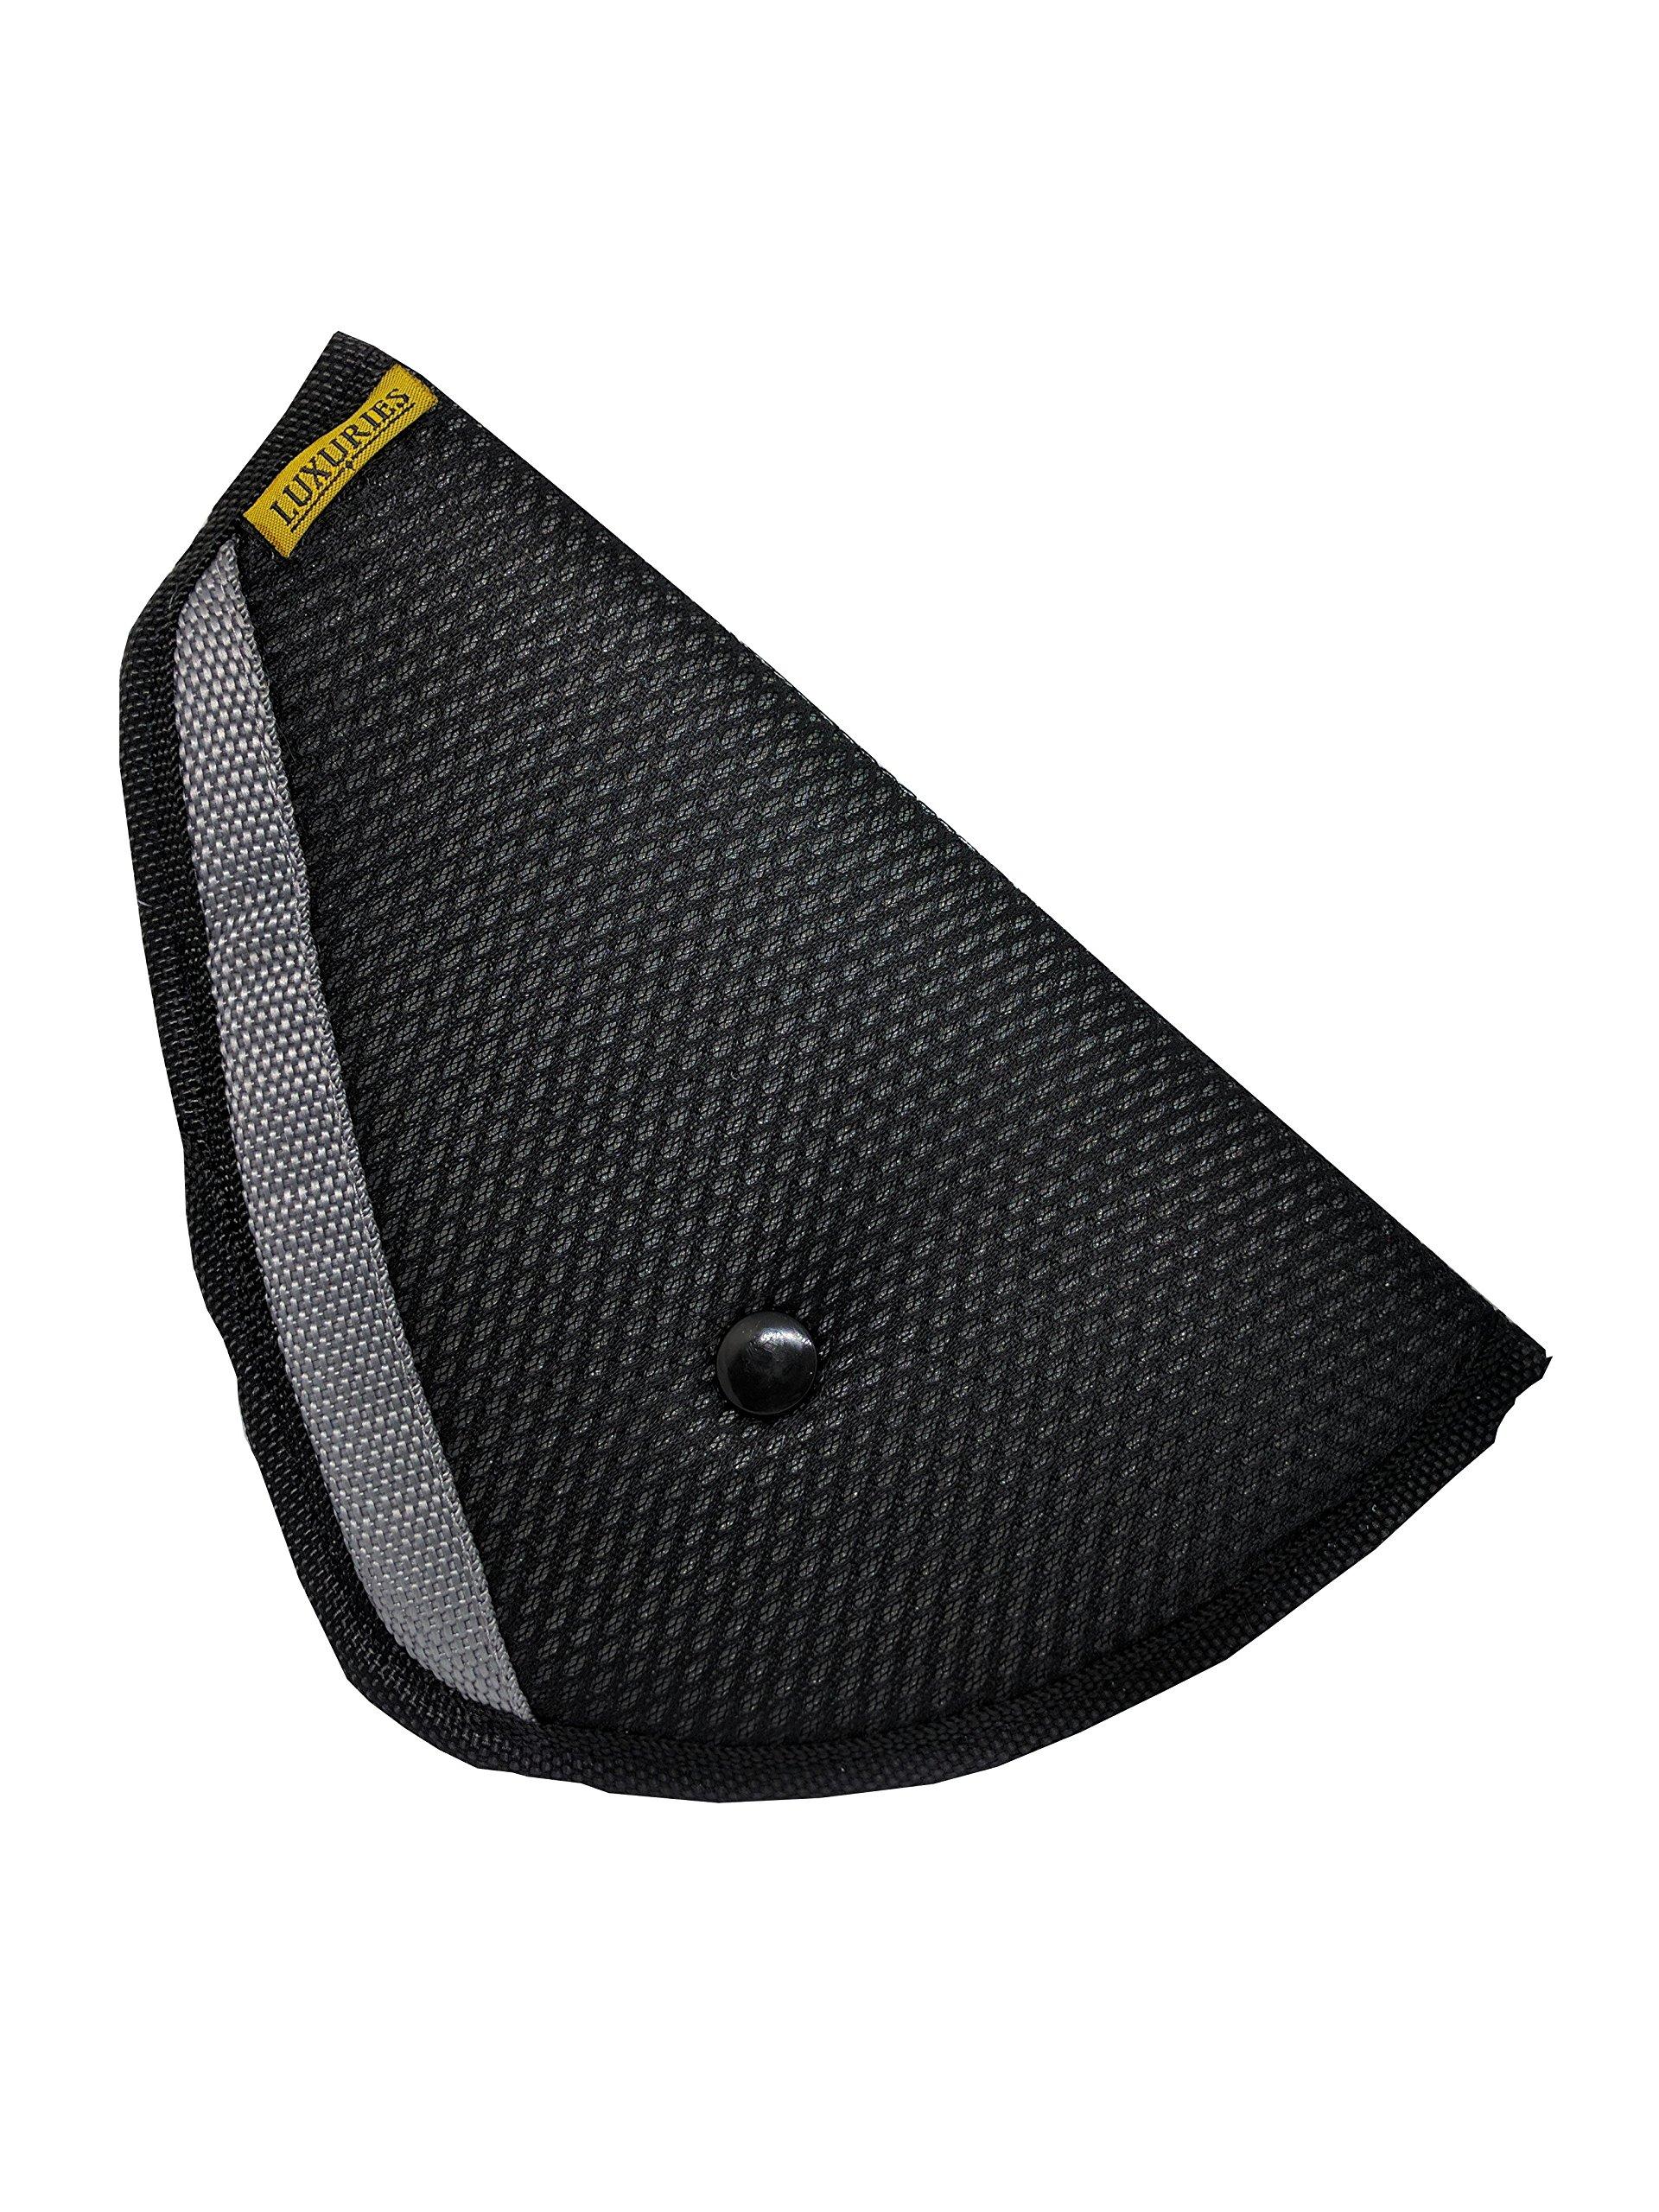 Amazon Com Seat Belt Adjuster Car Safety Cover Strap